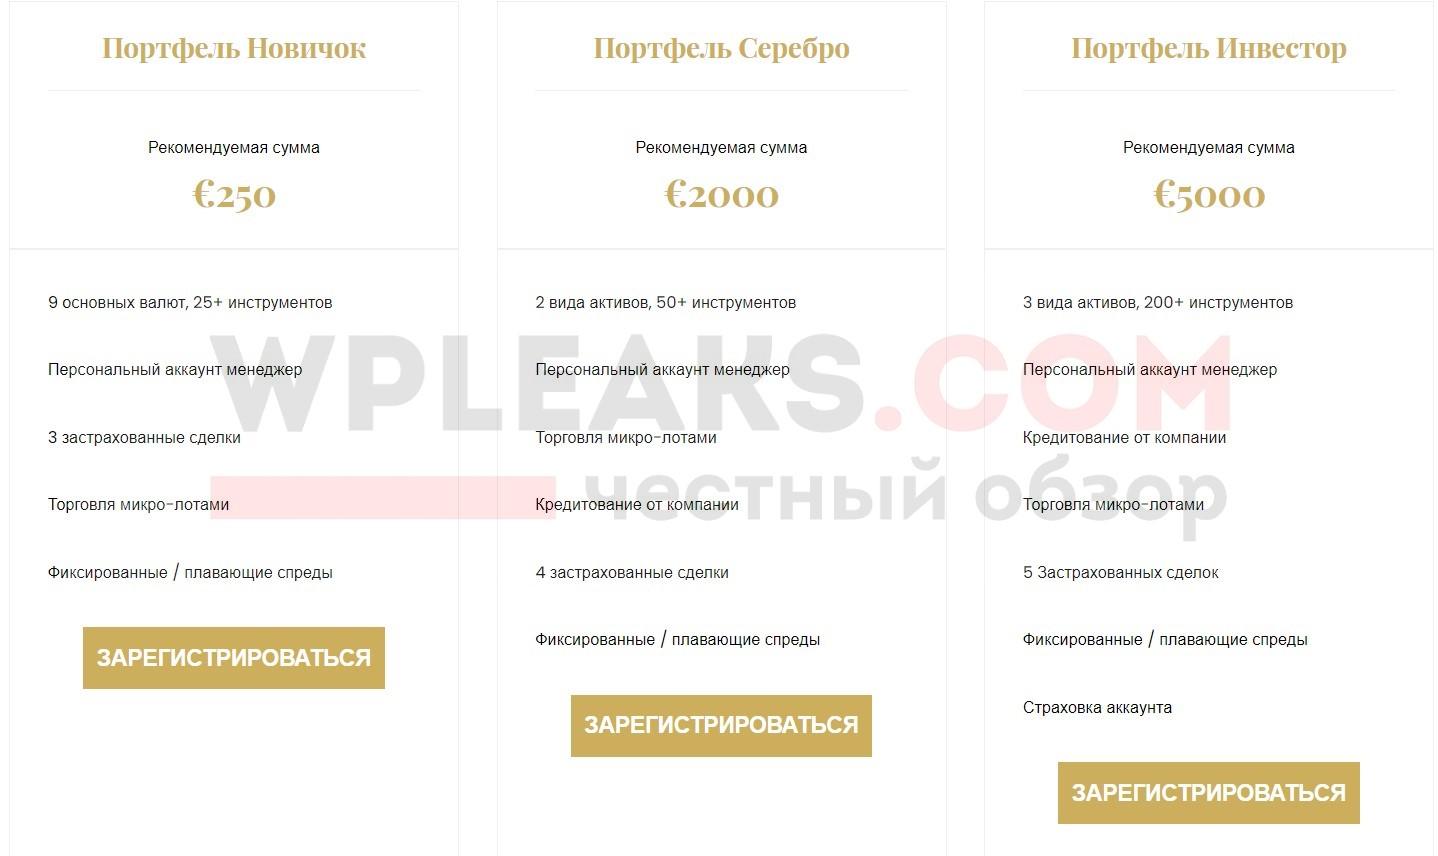 Acces Capital платит или нет